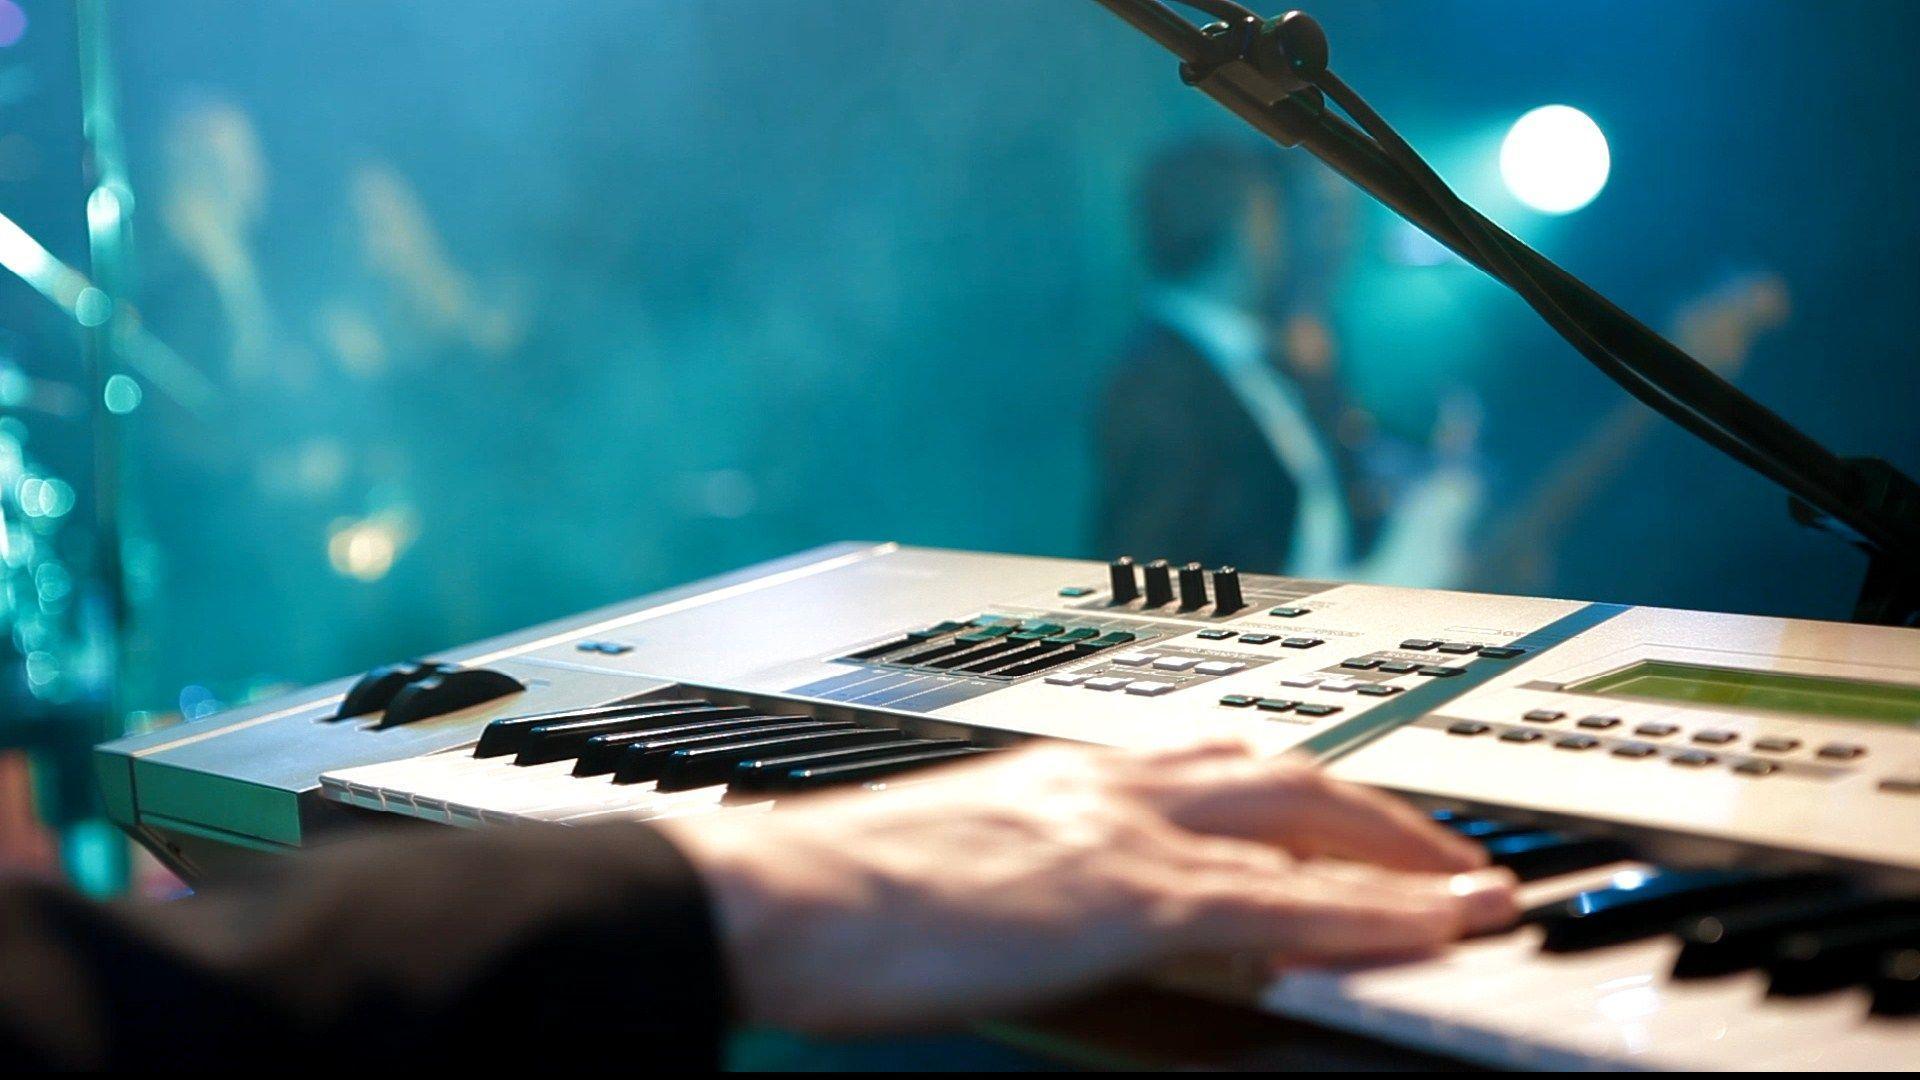 Music Keyboard Wallpapers  Wallpaper Cave